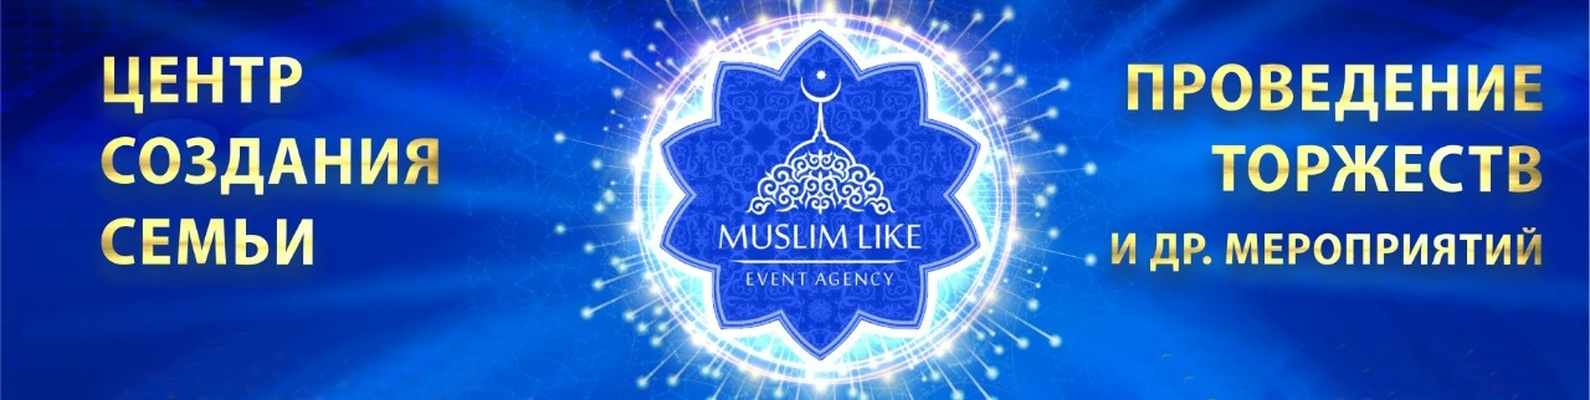 Muslim Like